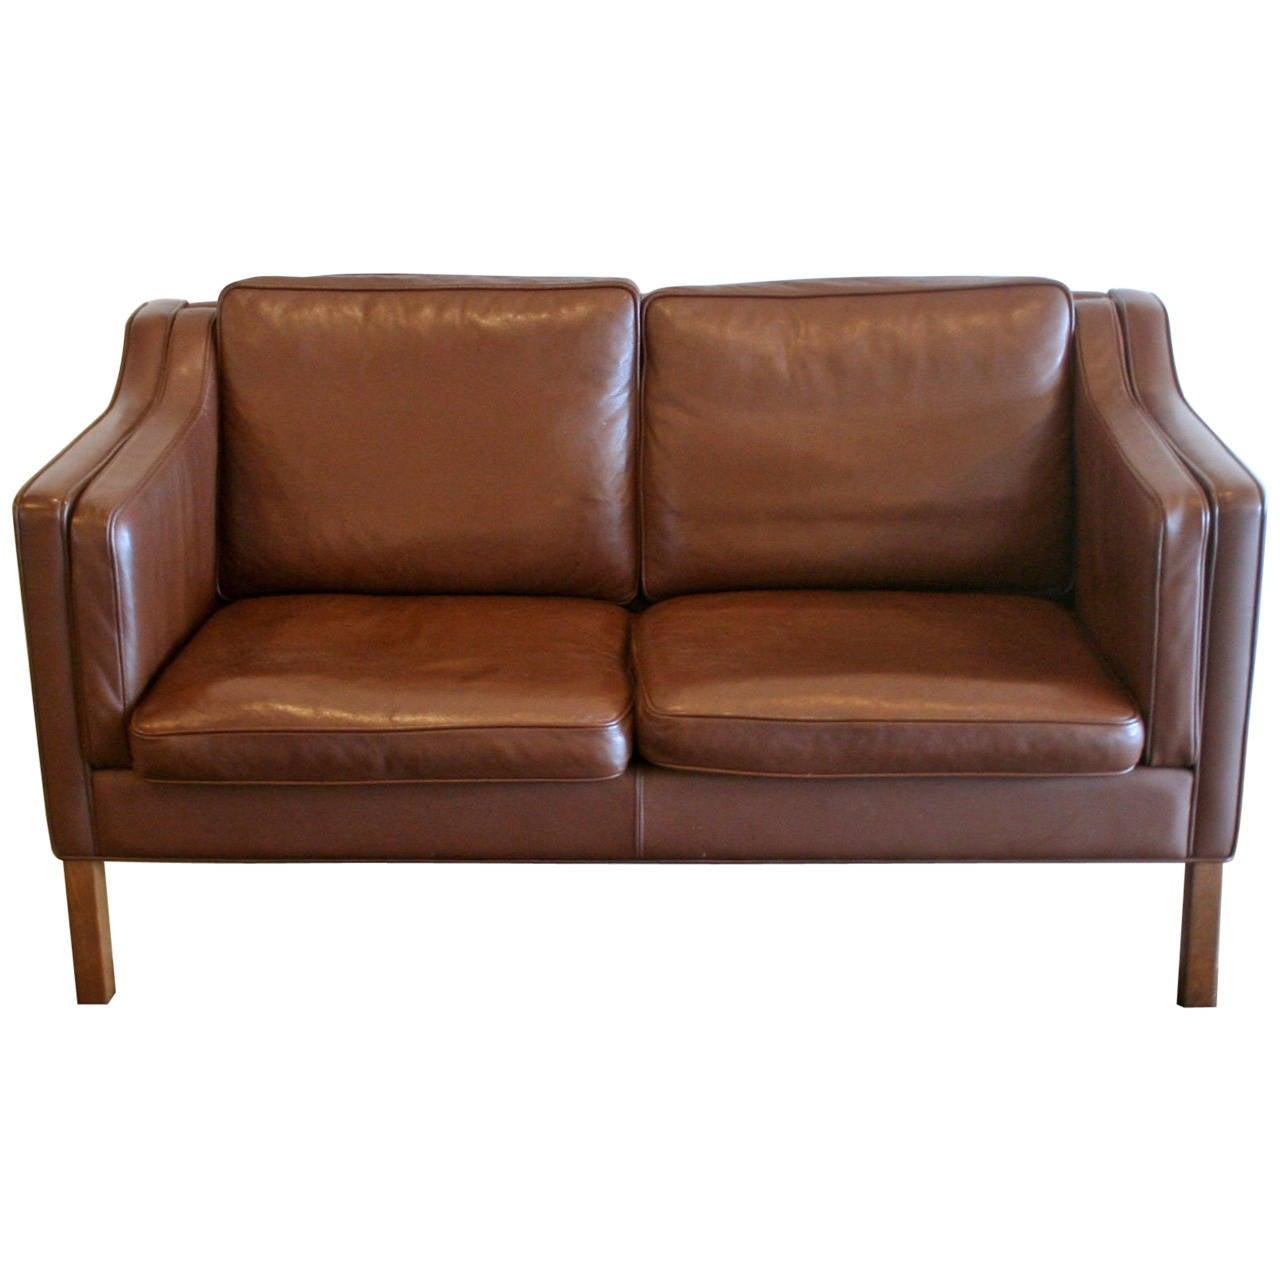 vintage danish leather two seat sofa at 1stdibs